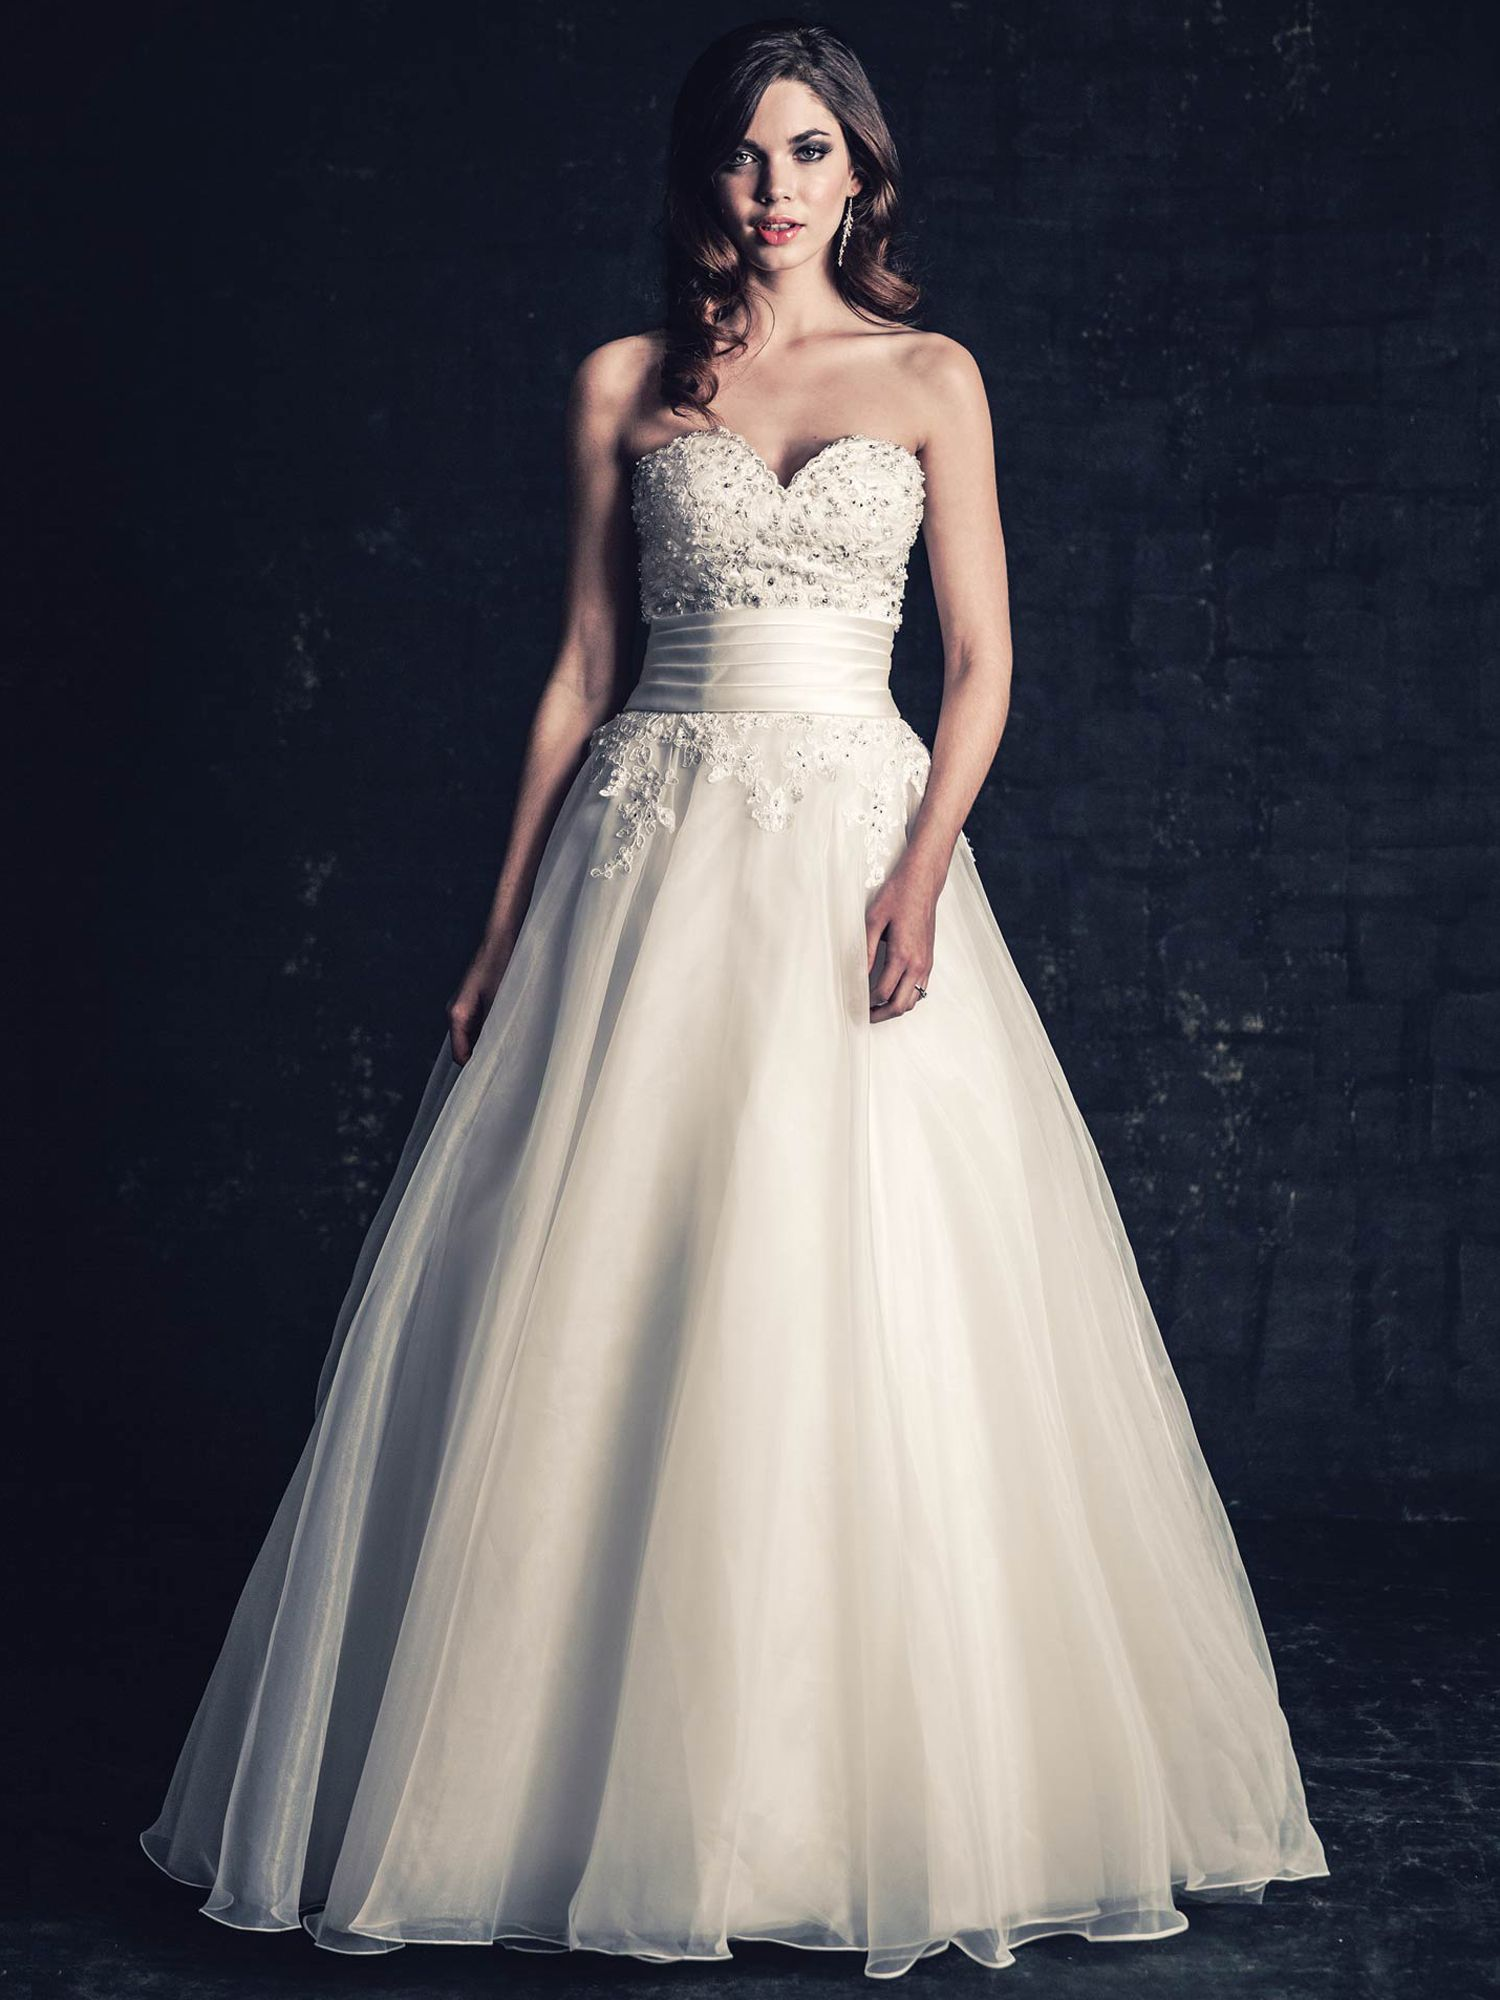 Style be crafts pinterest wedding dress wedding and